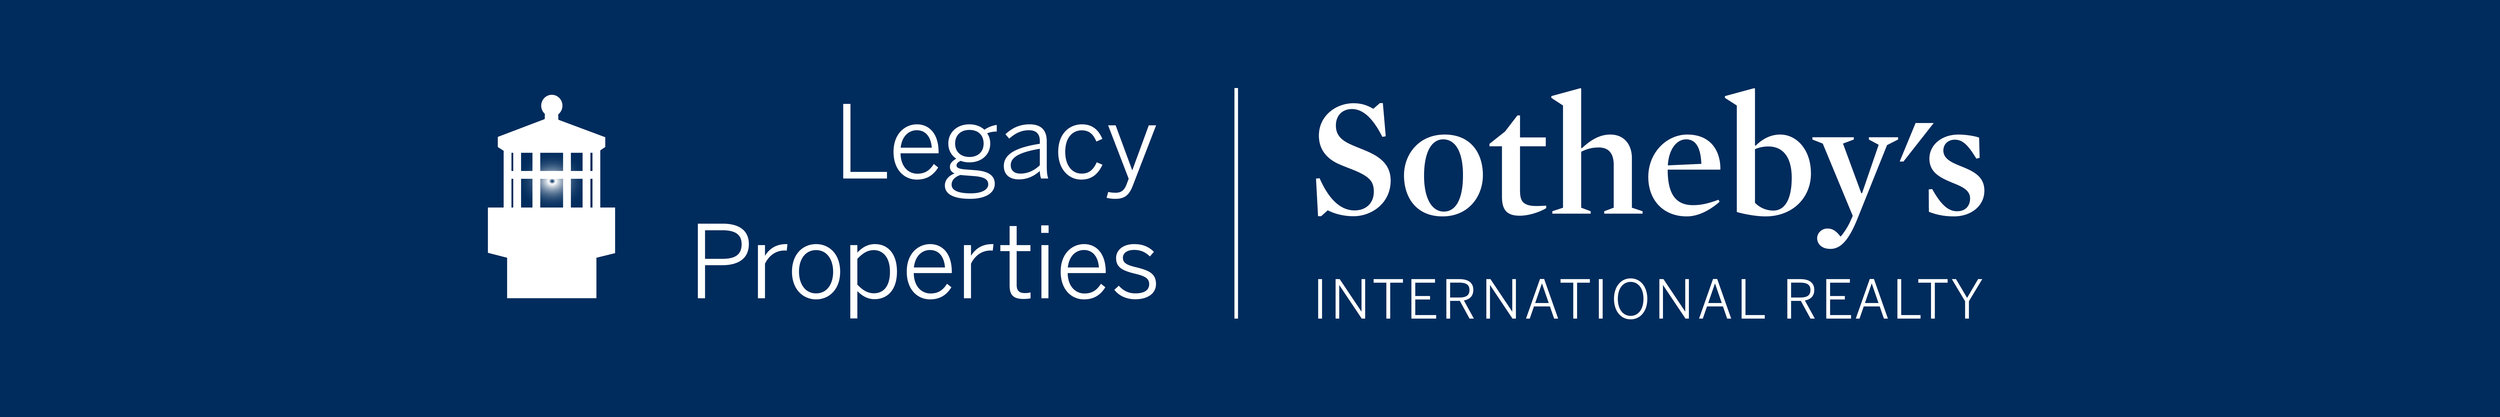 sothebys legacy logo blue.jpg